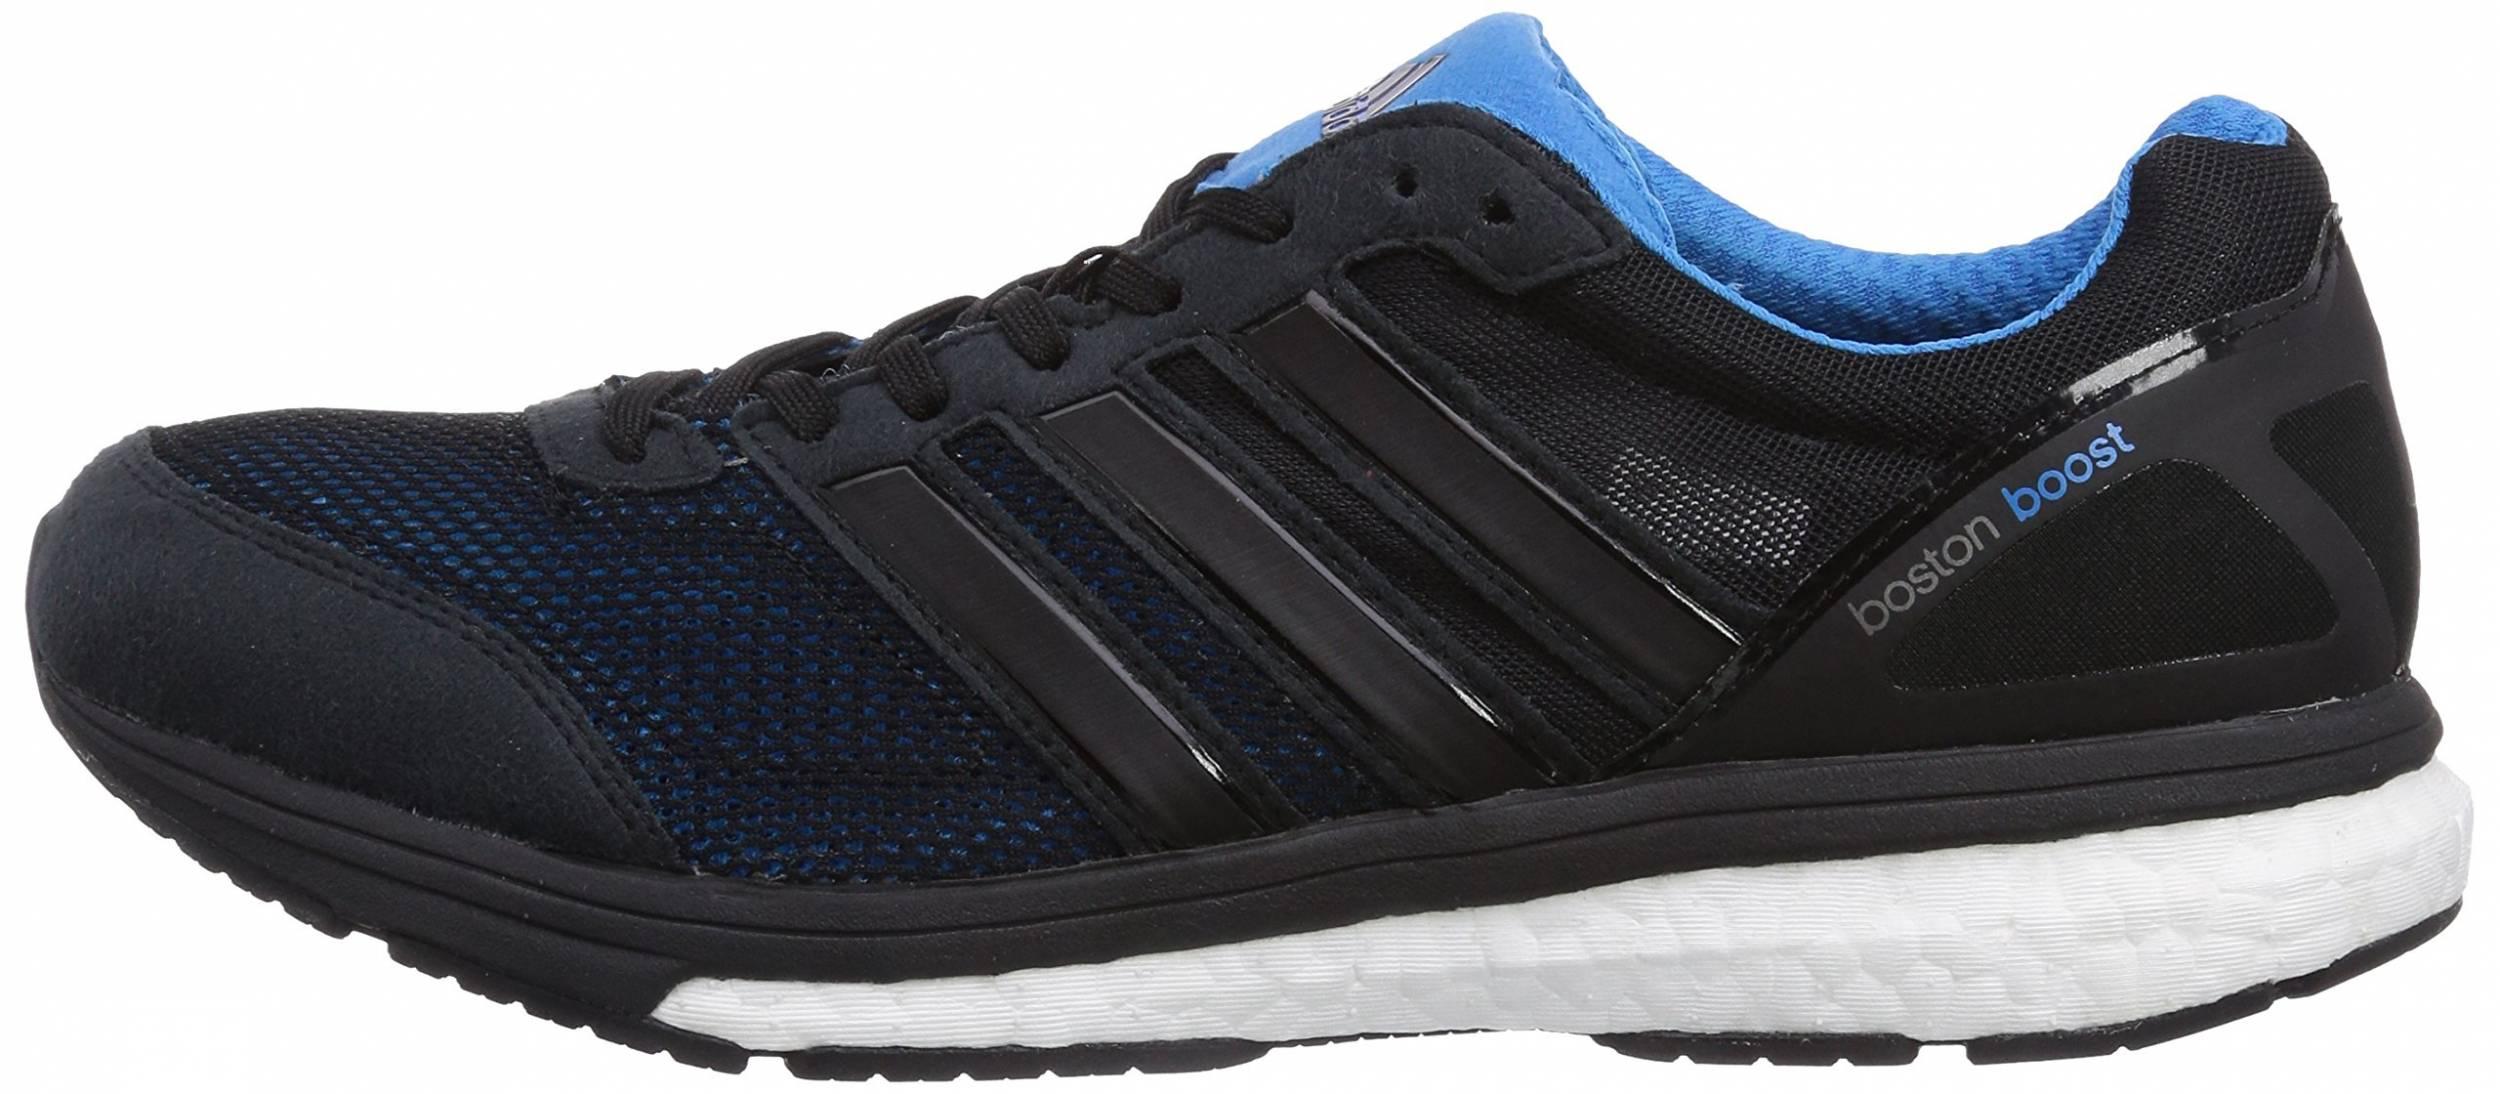 peligroso Miserable acerca de  $150 + Review of Adidas Adizero Boston Boost 5 | RunRepeat